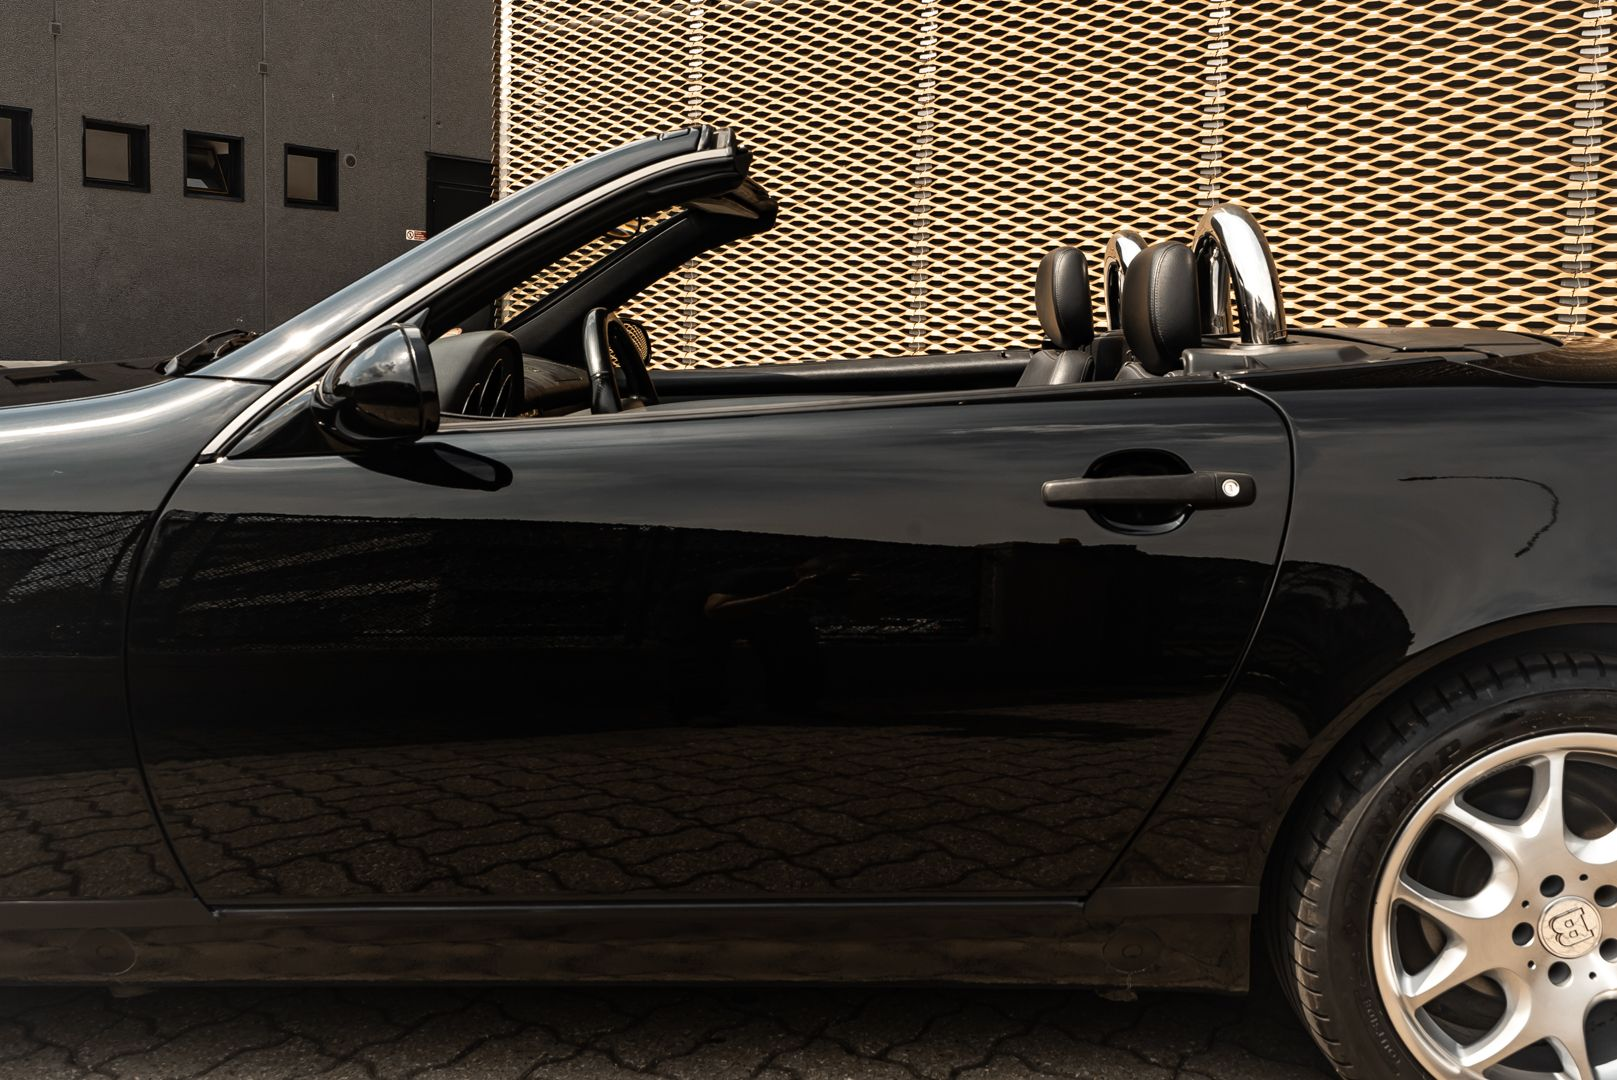 1998 Mercedes-Benz SLK 230 Brabus K1 73750